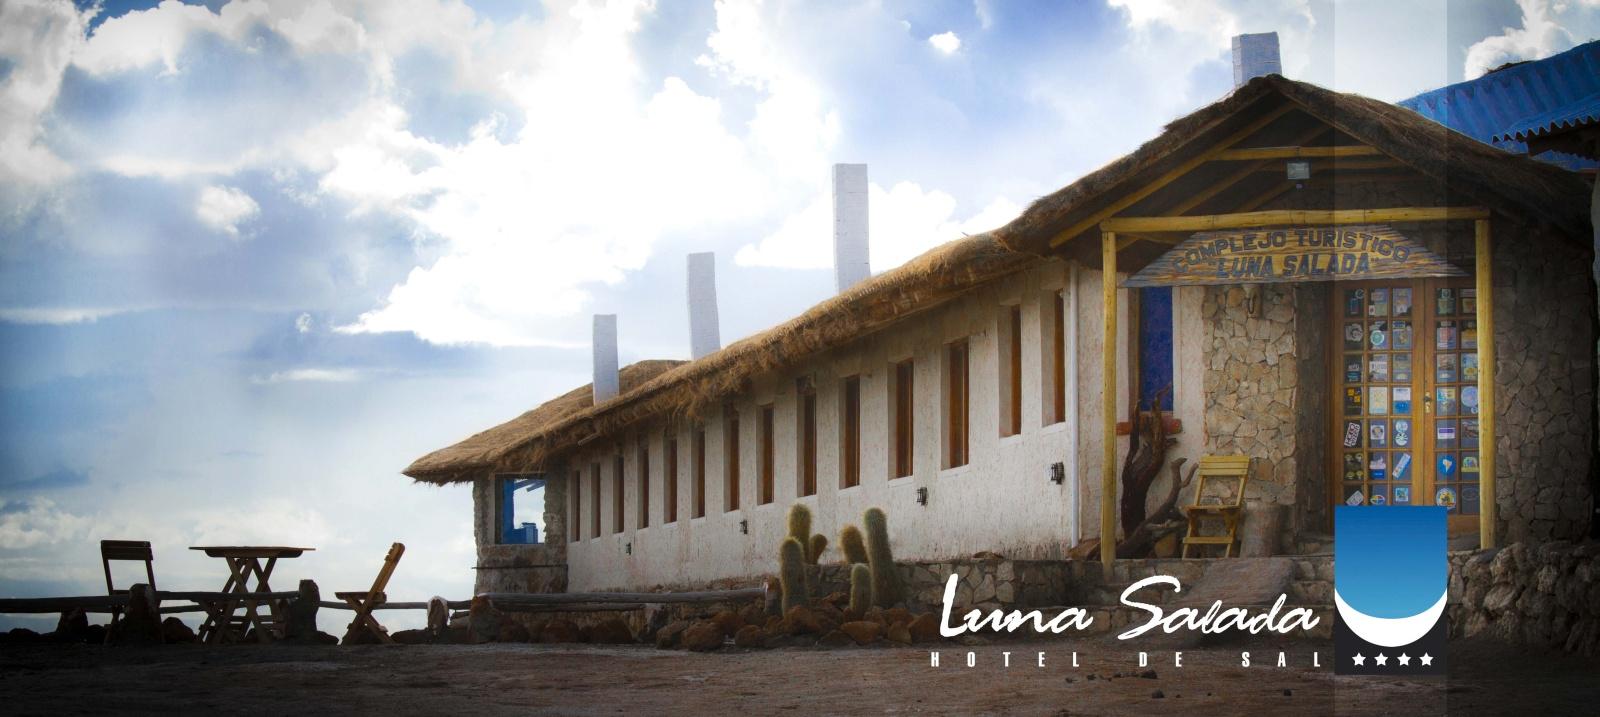 Book Online Hotel De Sal Luna Salada Panorama